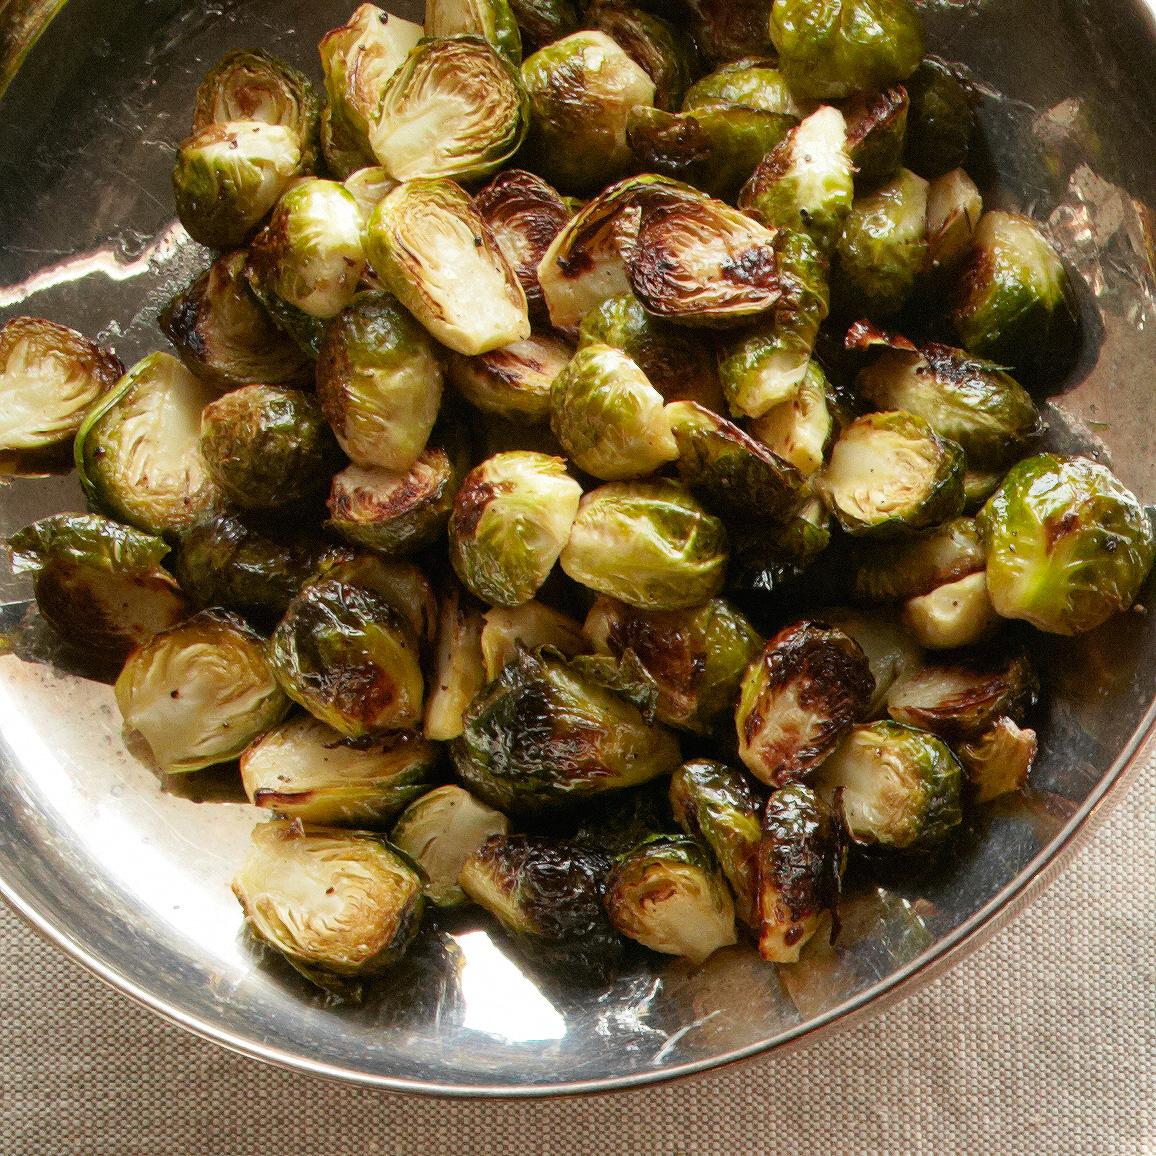 https://www.rachaelraymag.com/recipe/lemon-honey-roasted-brussels-sprouts